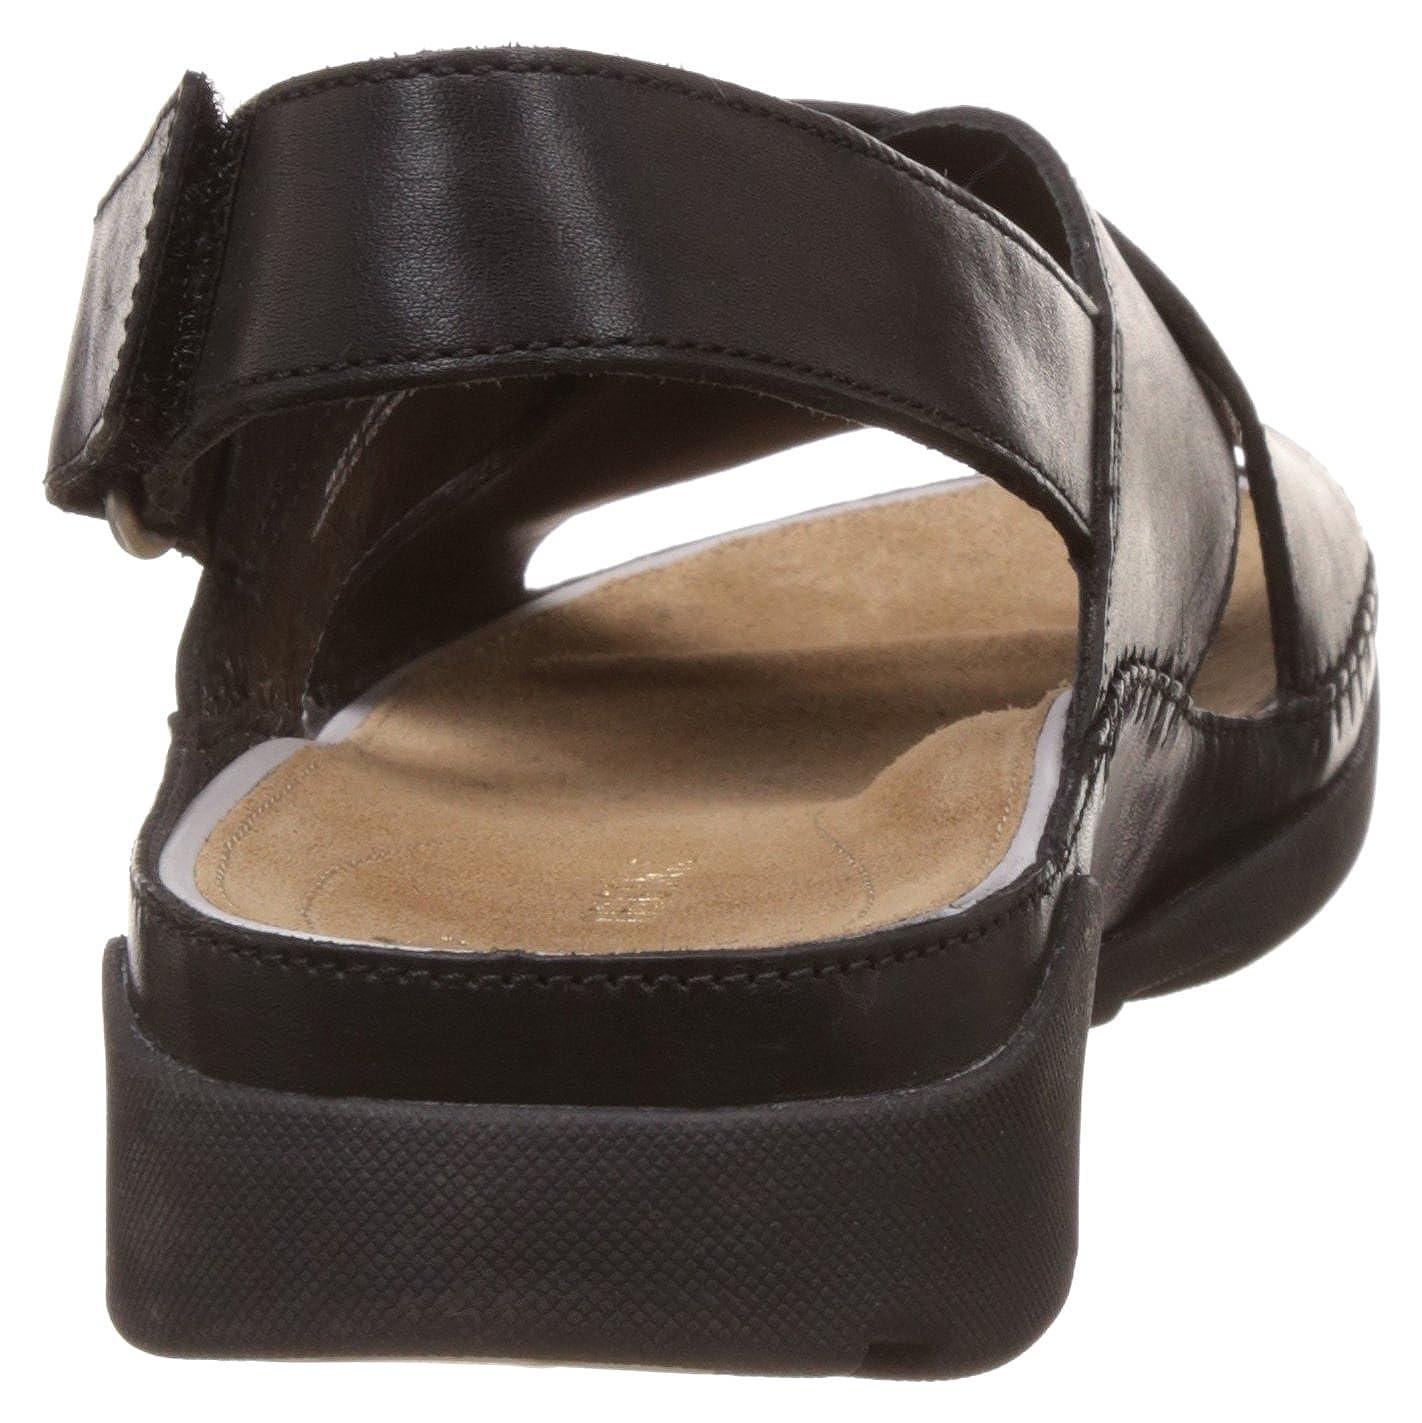 Women's Clarks Tri Open Toe Sandals Alexia bf6gYy7